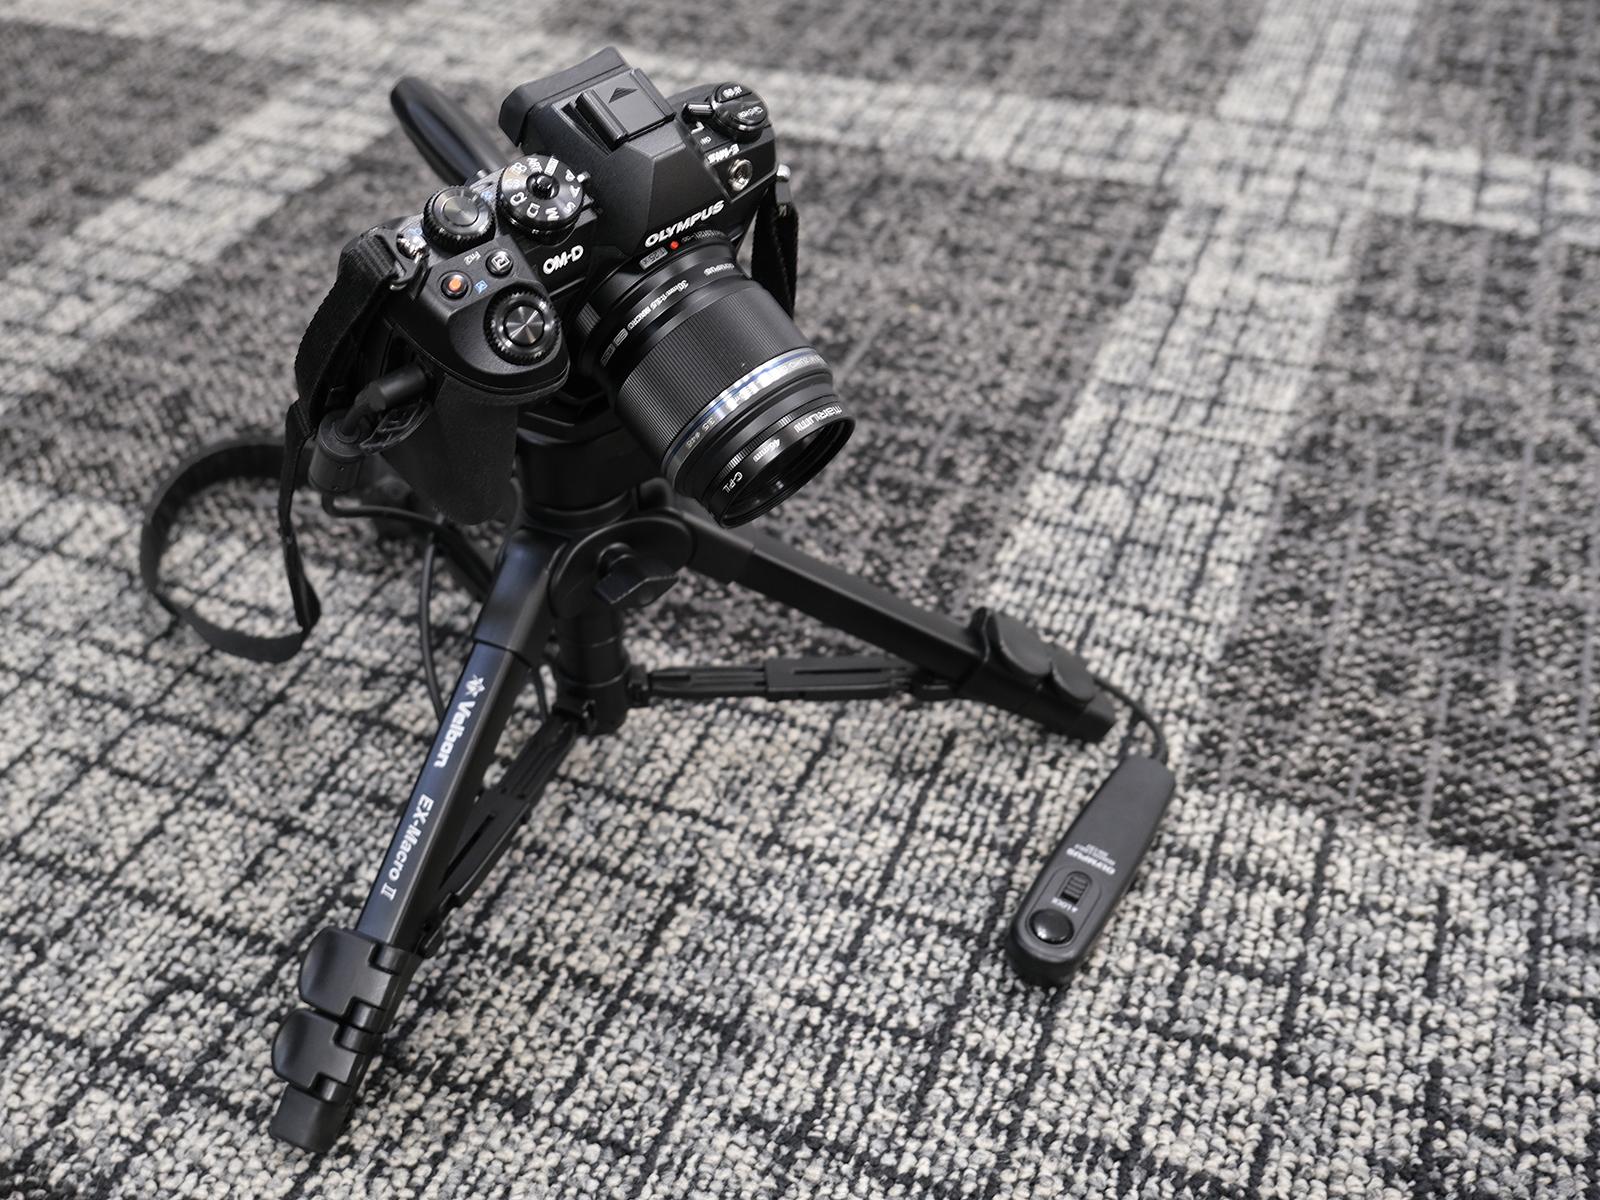 OLYMPUSM.ZUIKO DIGITAL ED 30mm F3.5 Macro